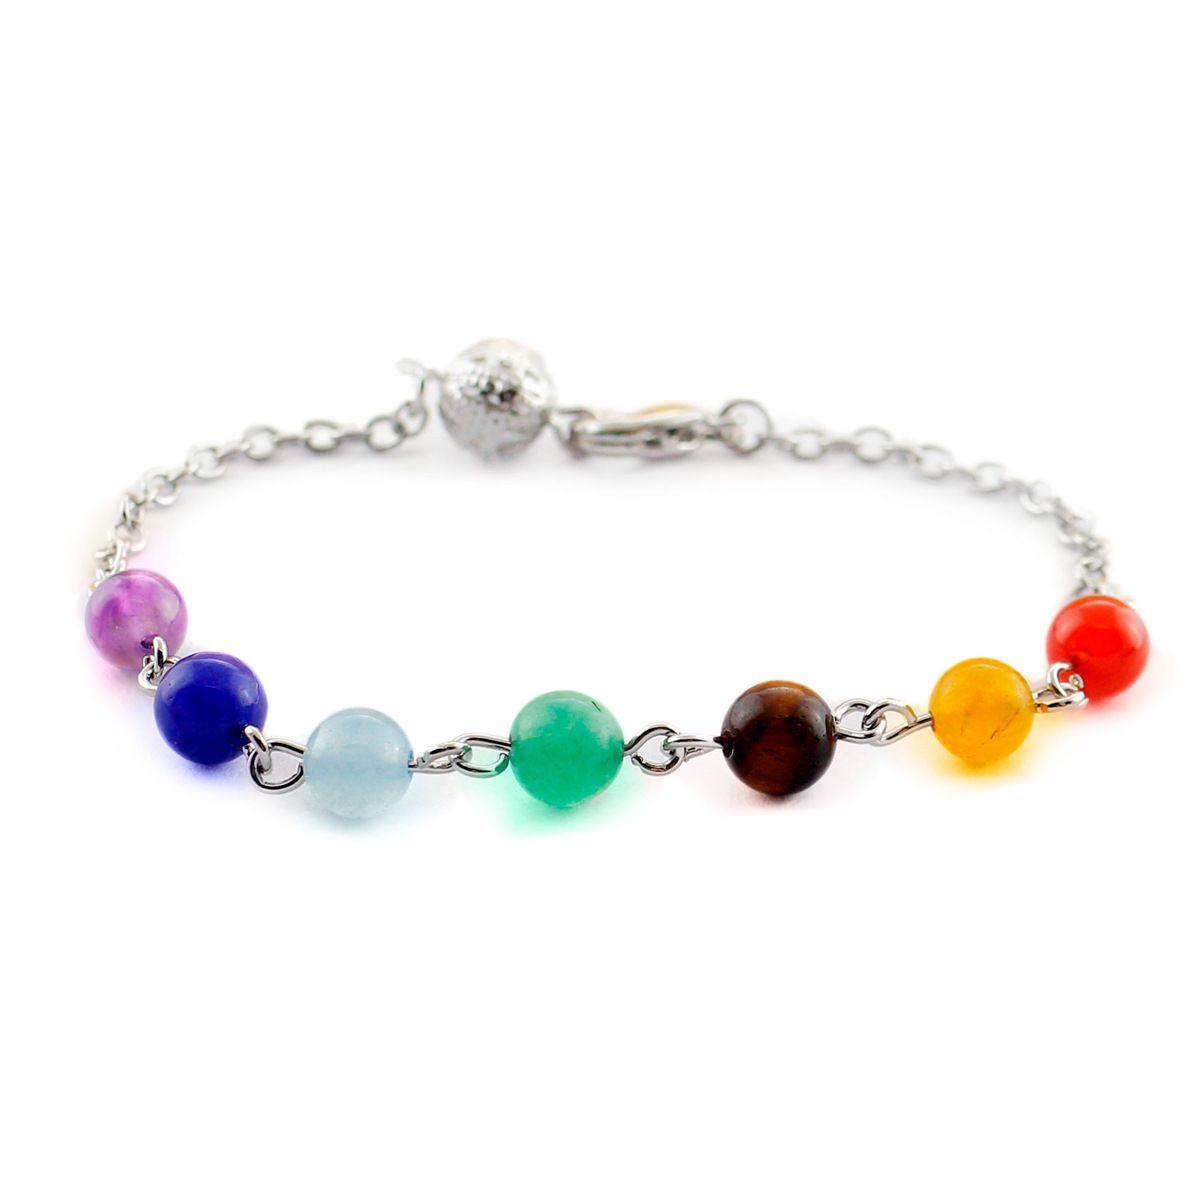 High Quality Nature Crystal Bead Bracelet